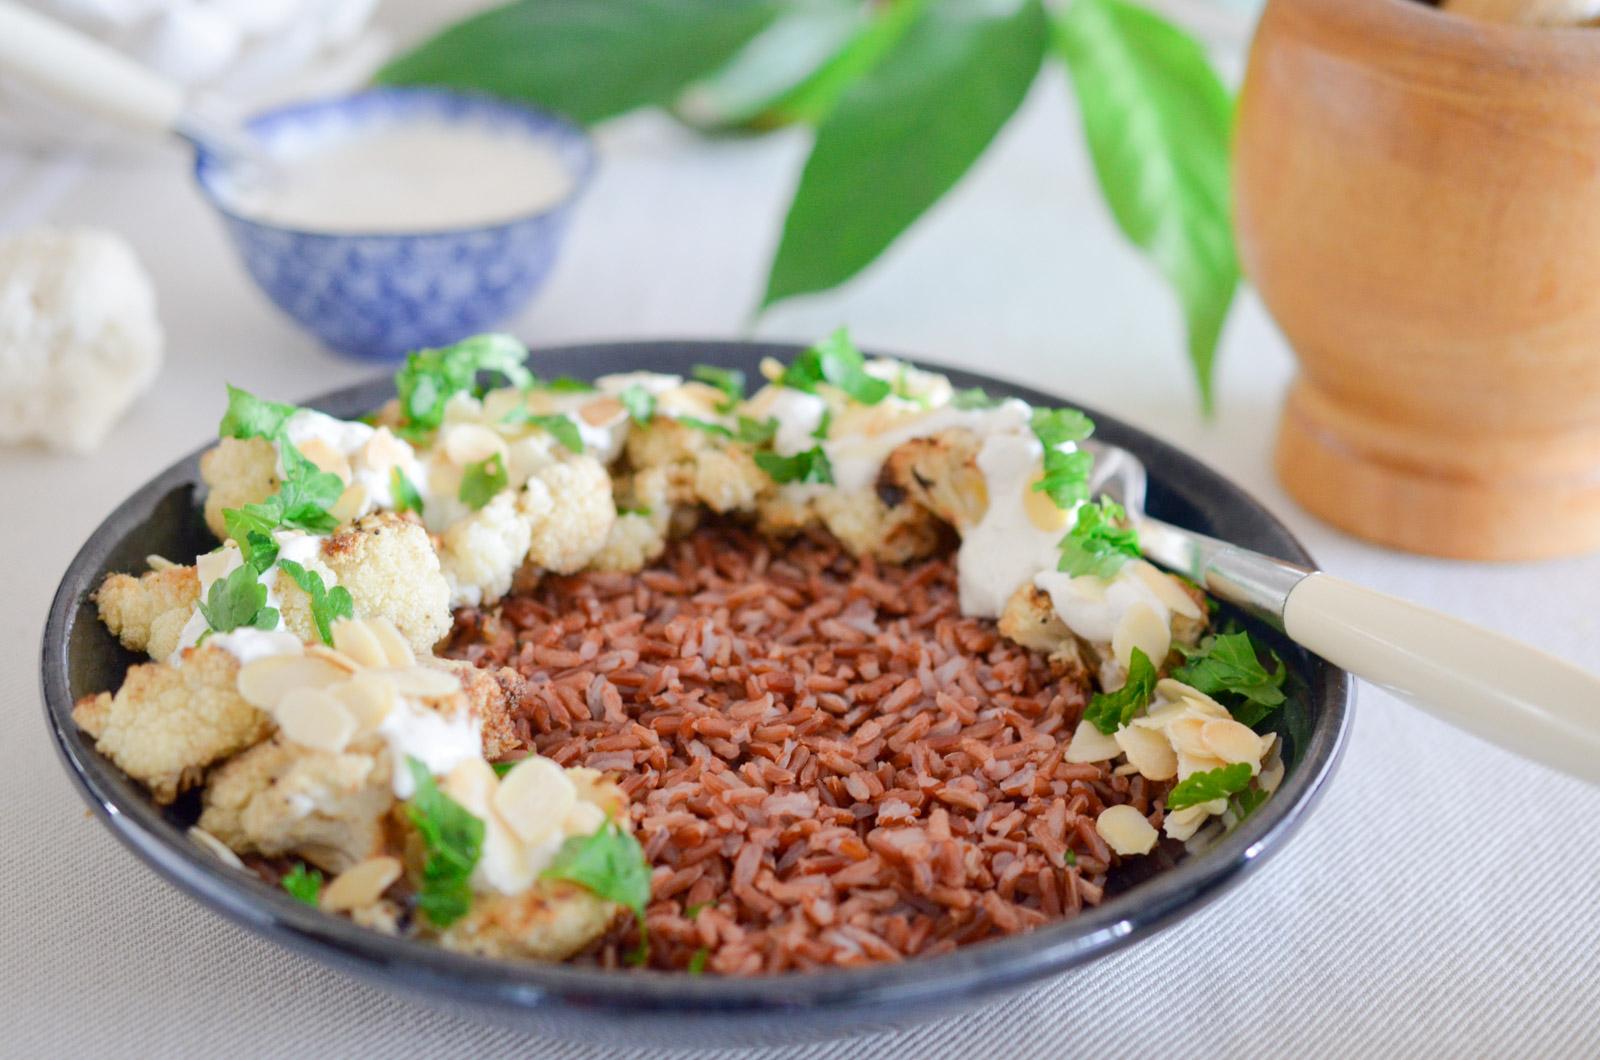 Chou Fleur Roti Cumin Sauce Yaourt 4 Sur 6